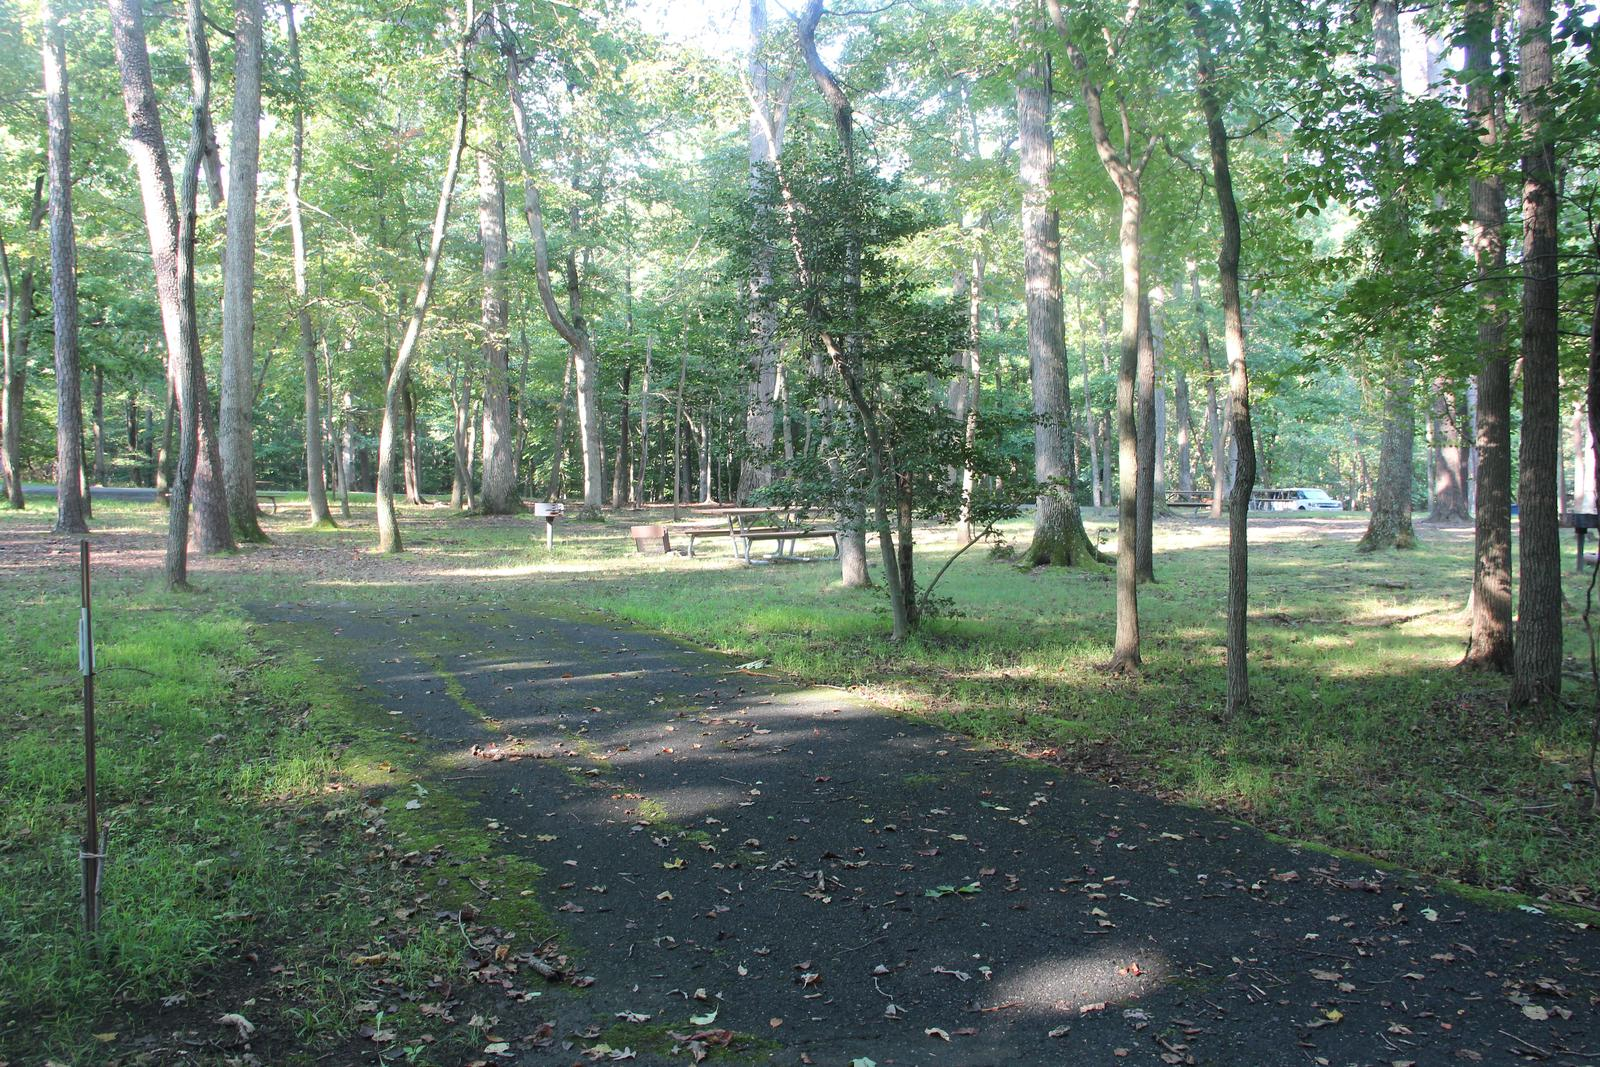 Greenbelt Park Campground C Loop Site 93